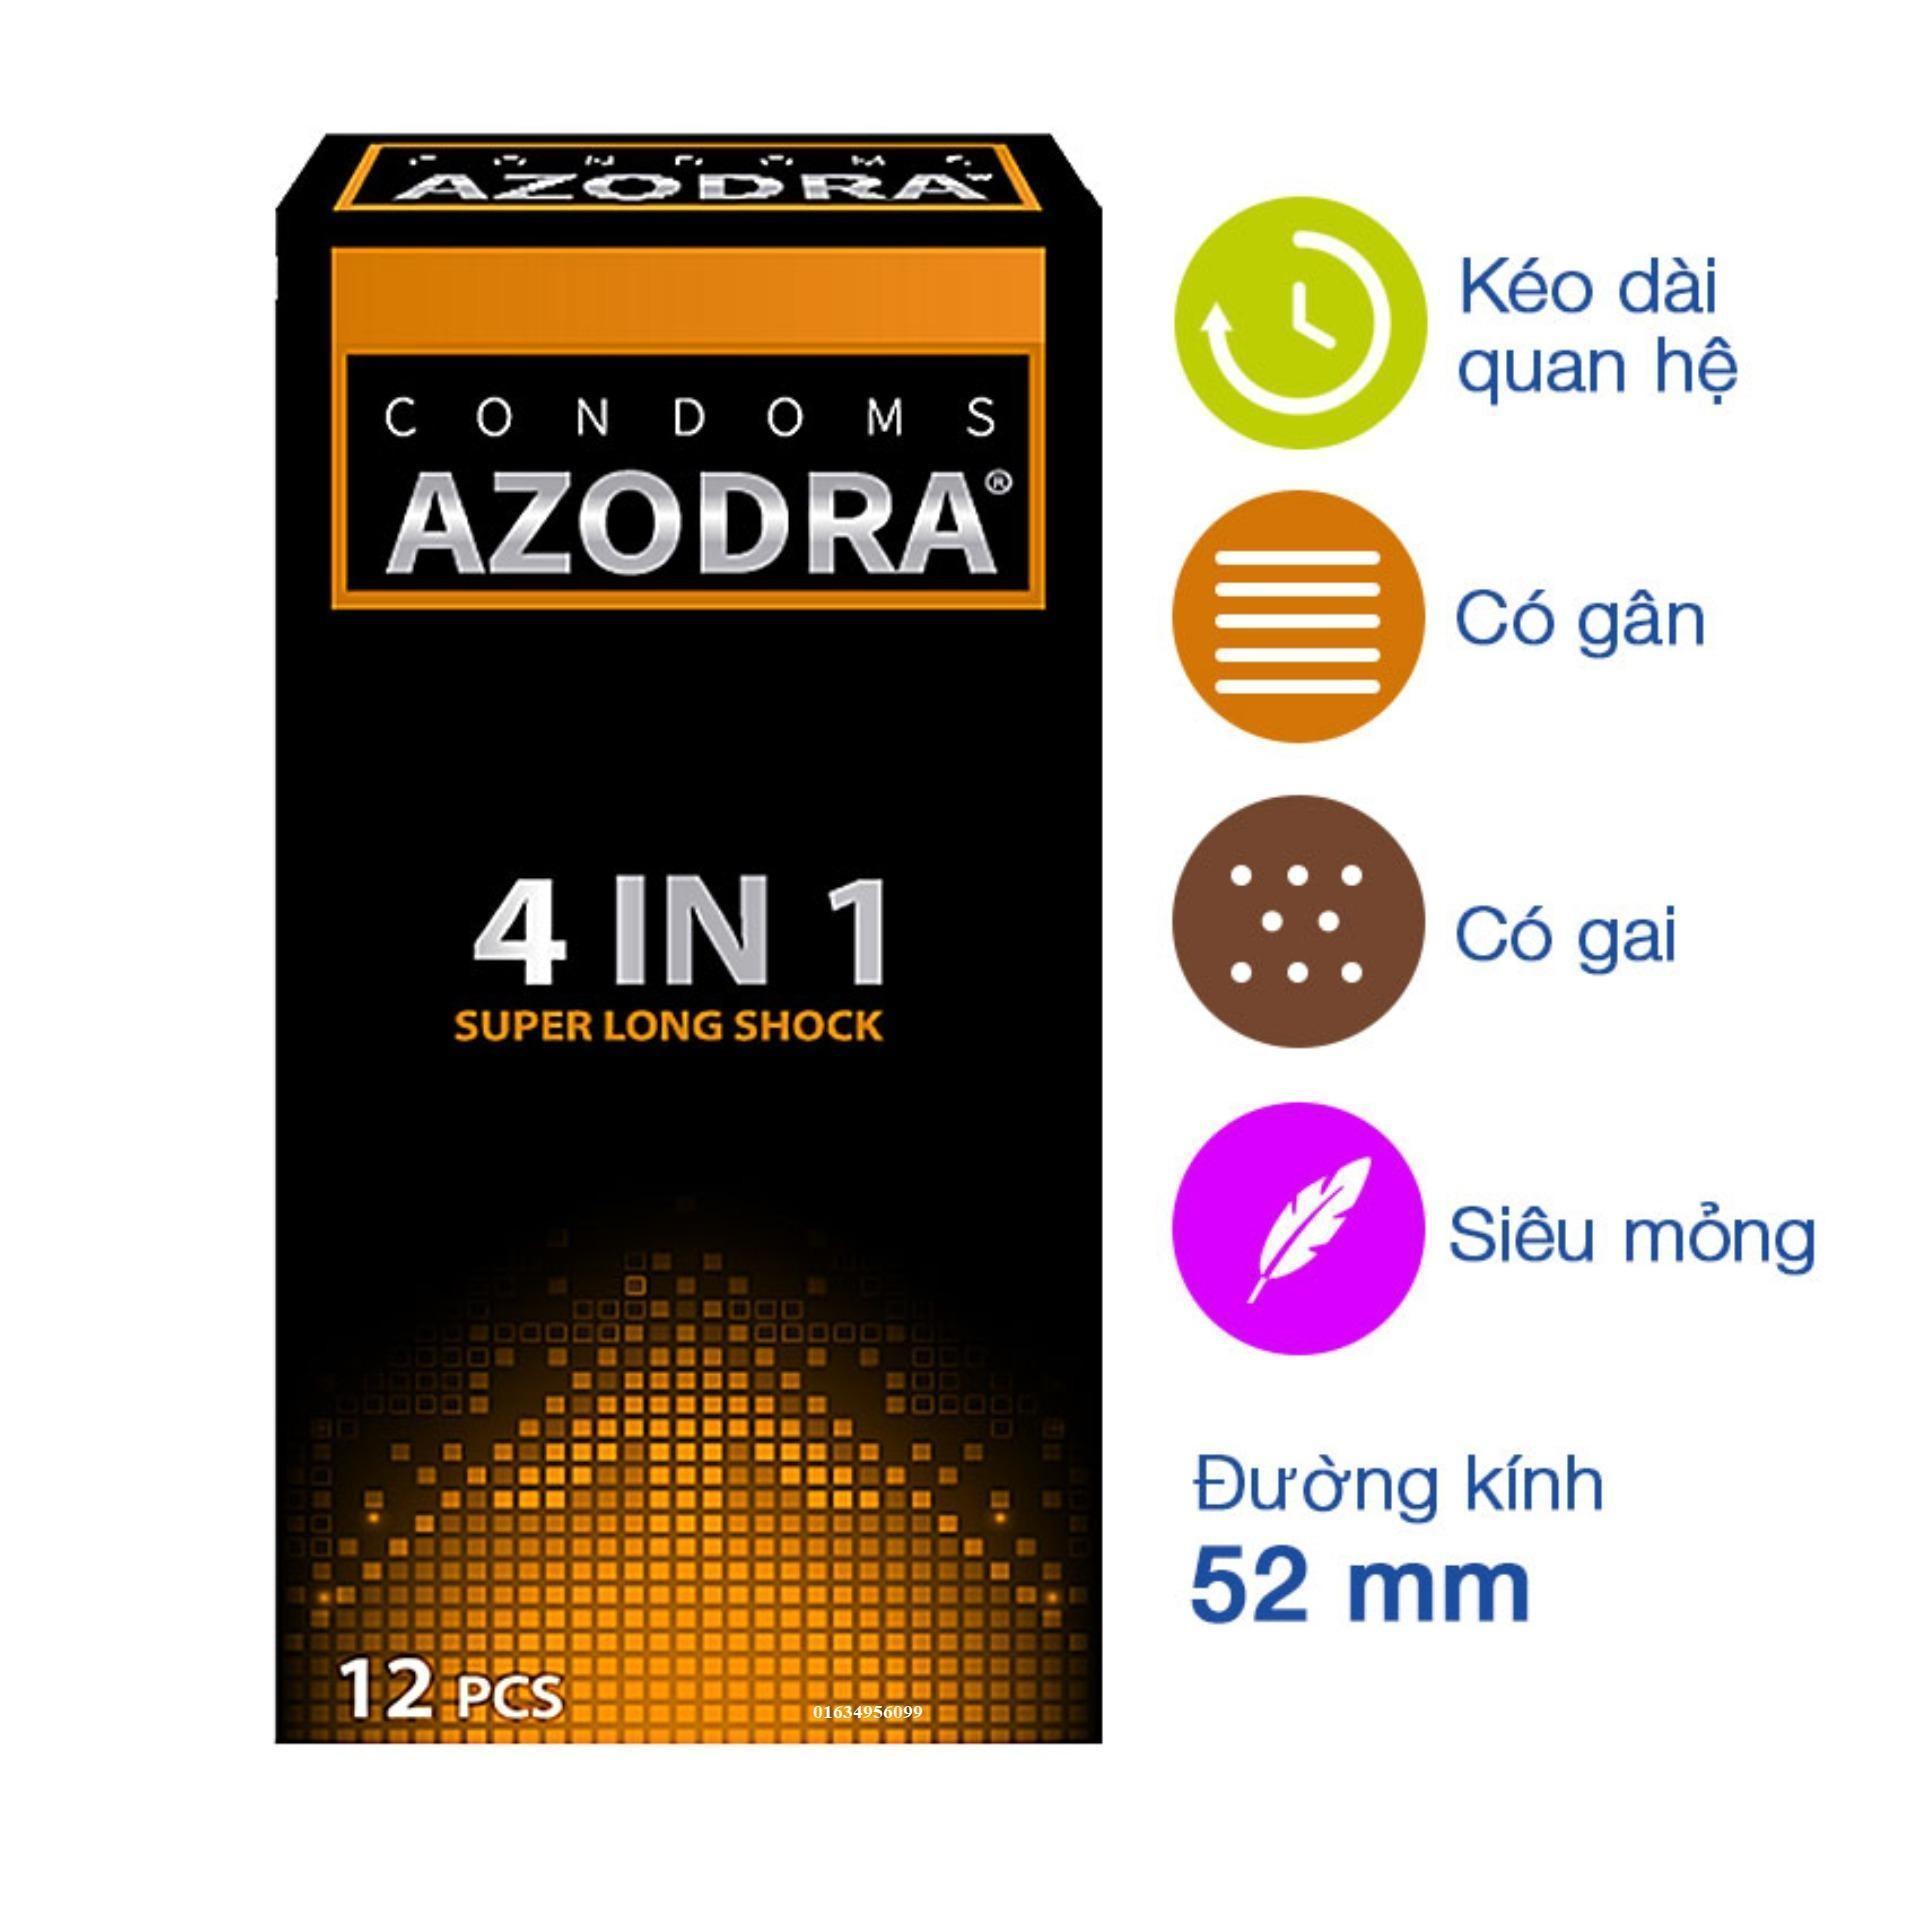 Bao cao su gân gai AZODRA kéo dài thời gian hộp 12c